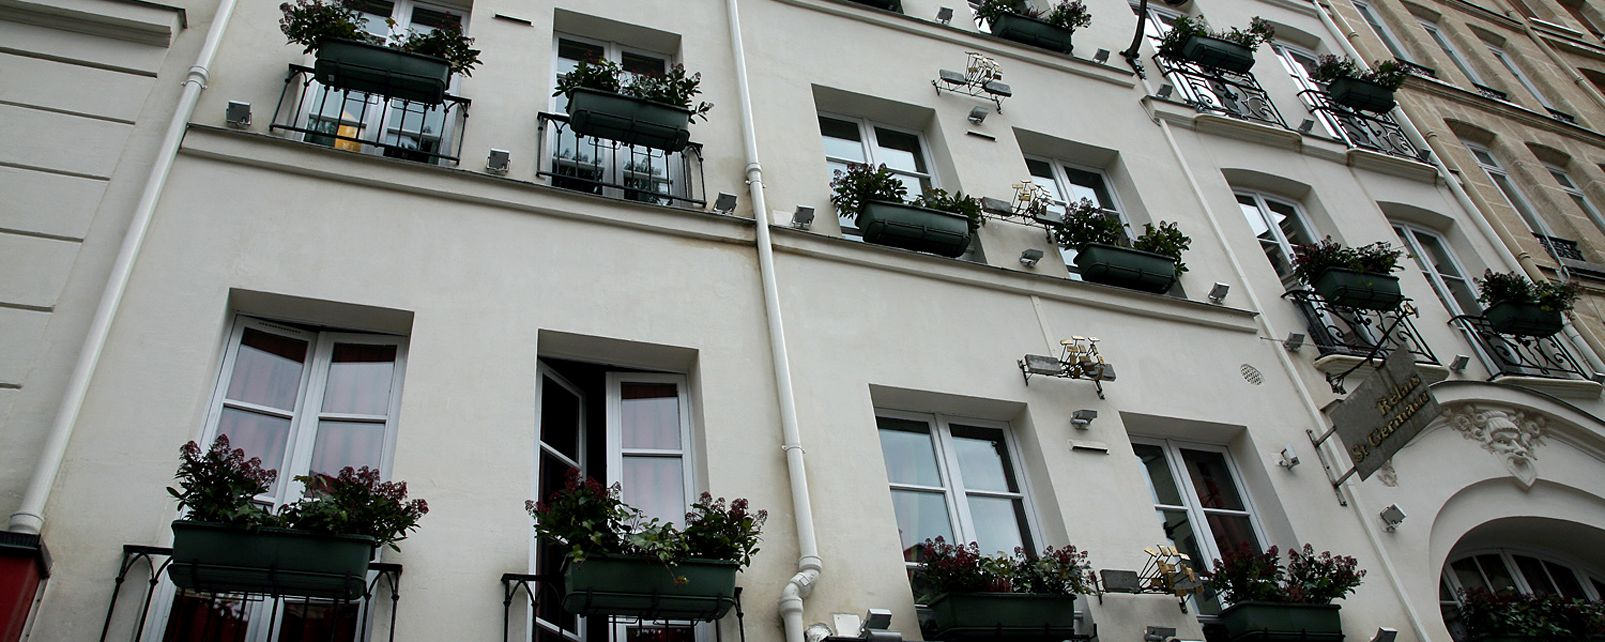 Hotel Atel Relais St Germain